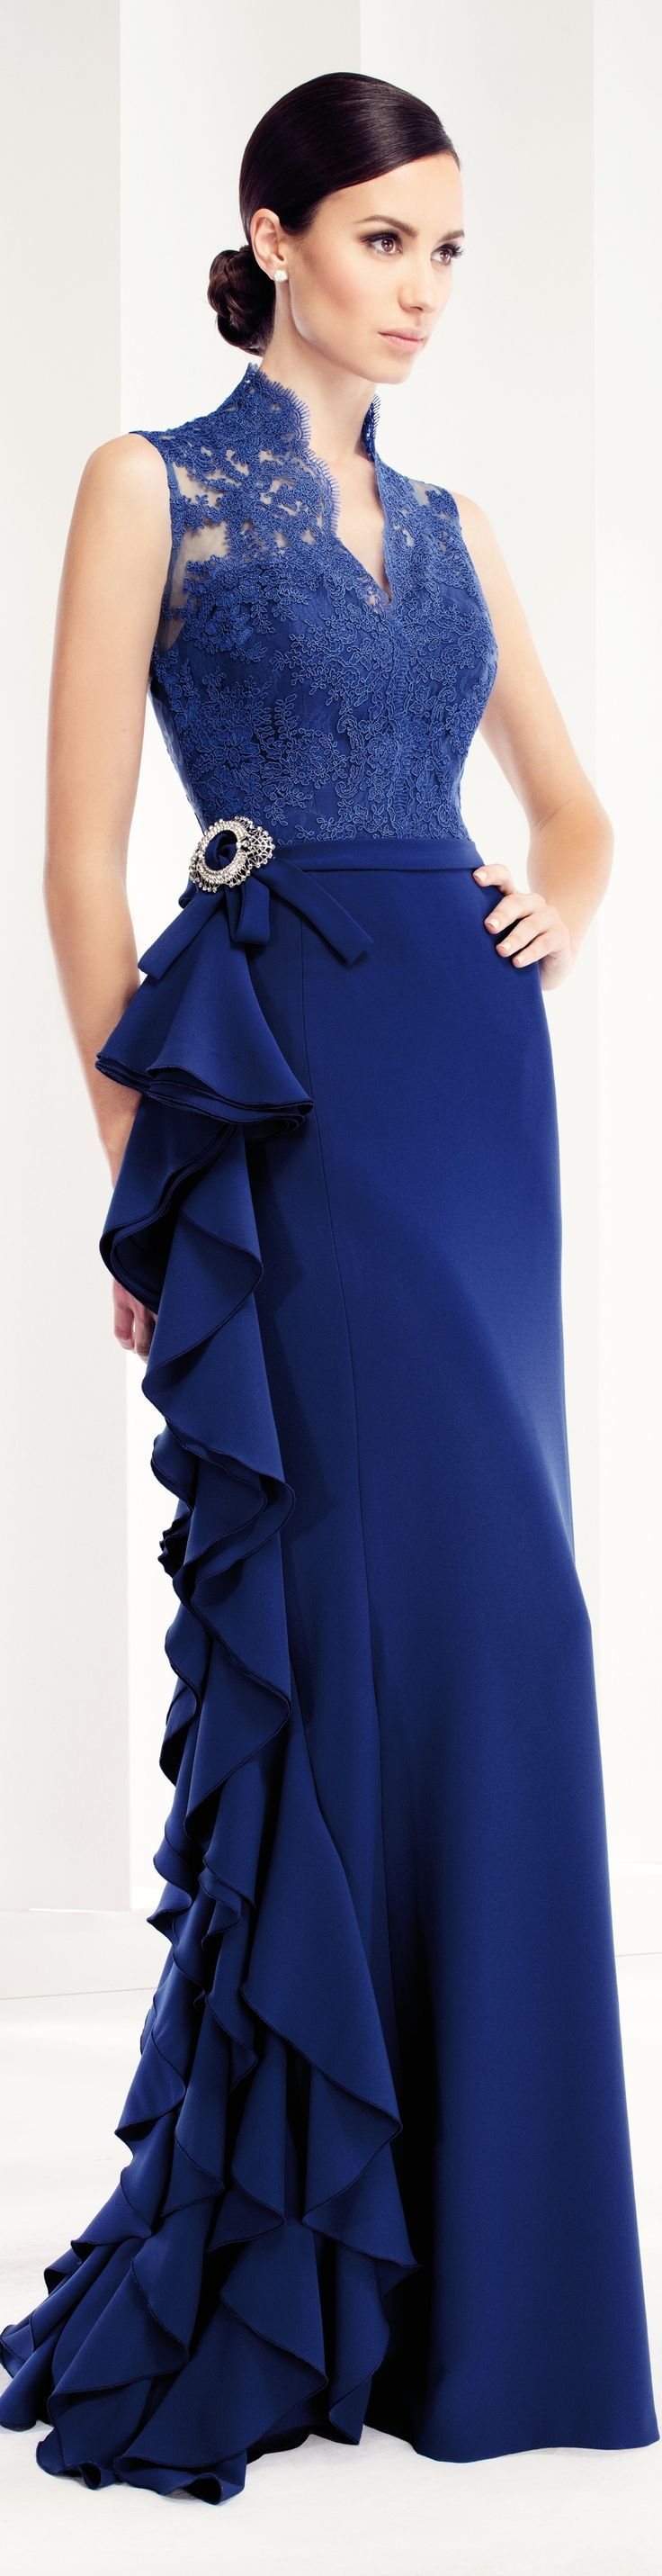 Vestidos de fiesta azul marino de encaje